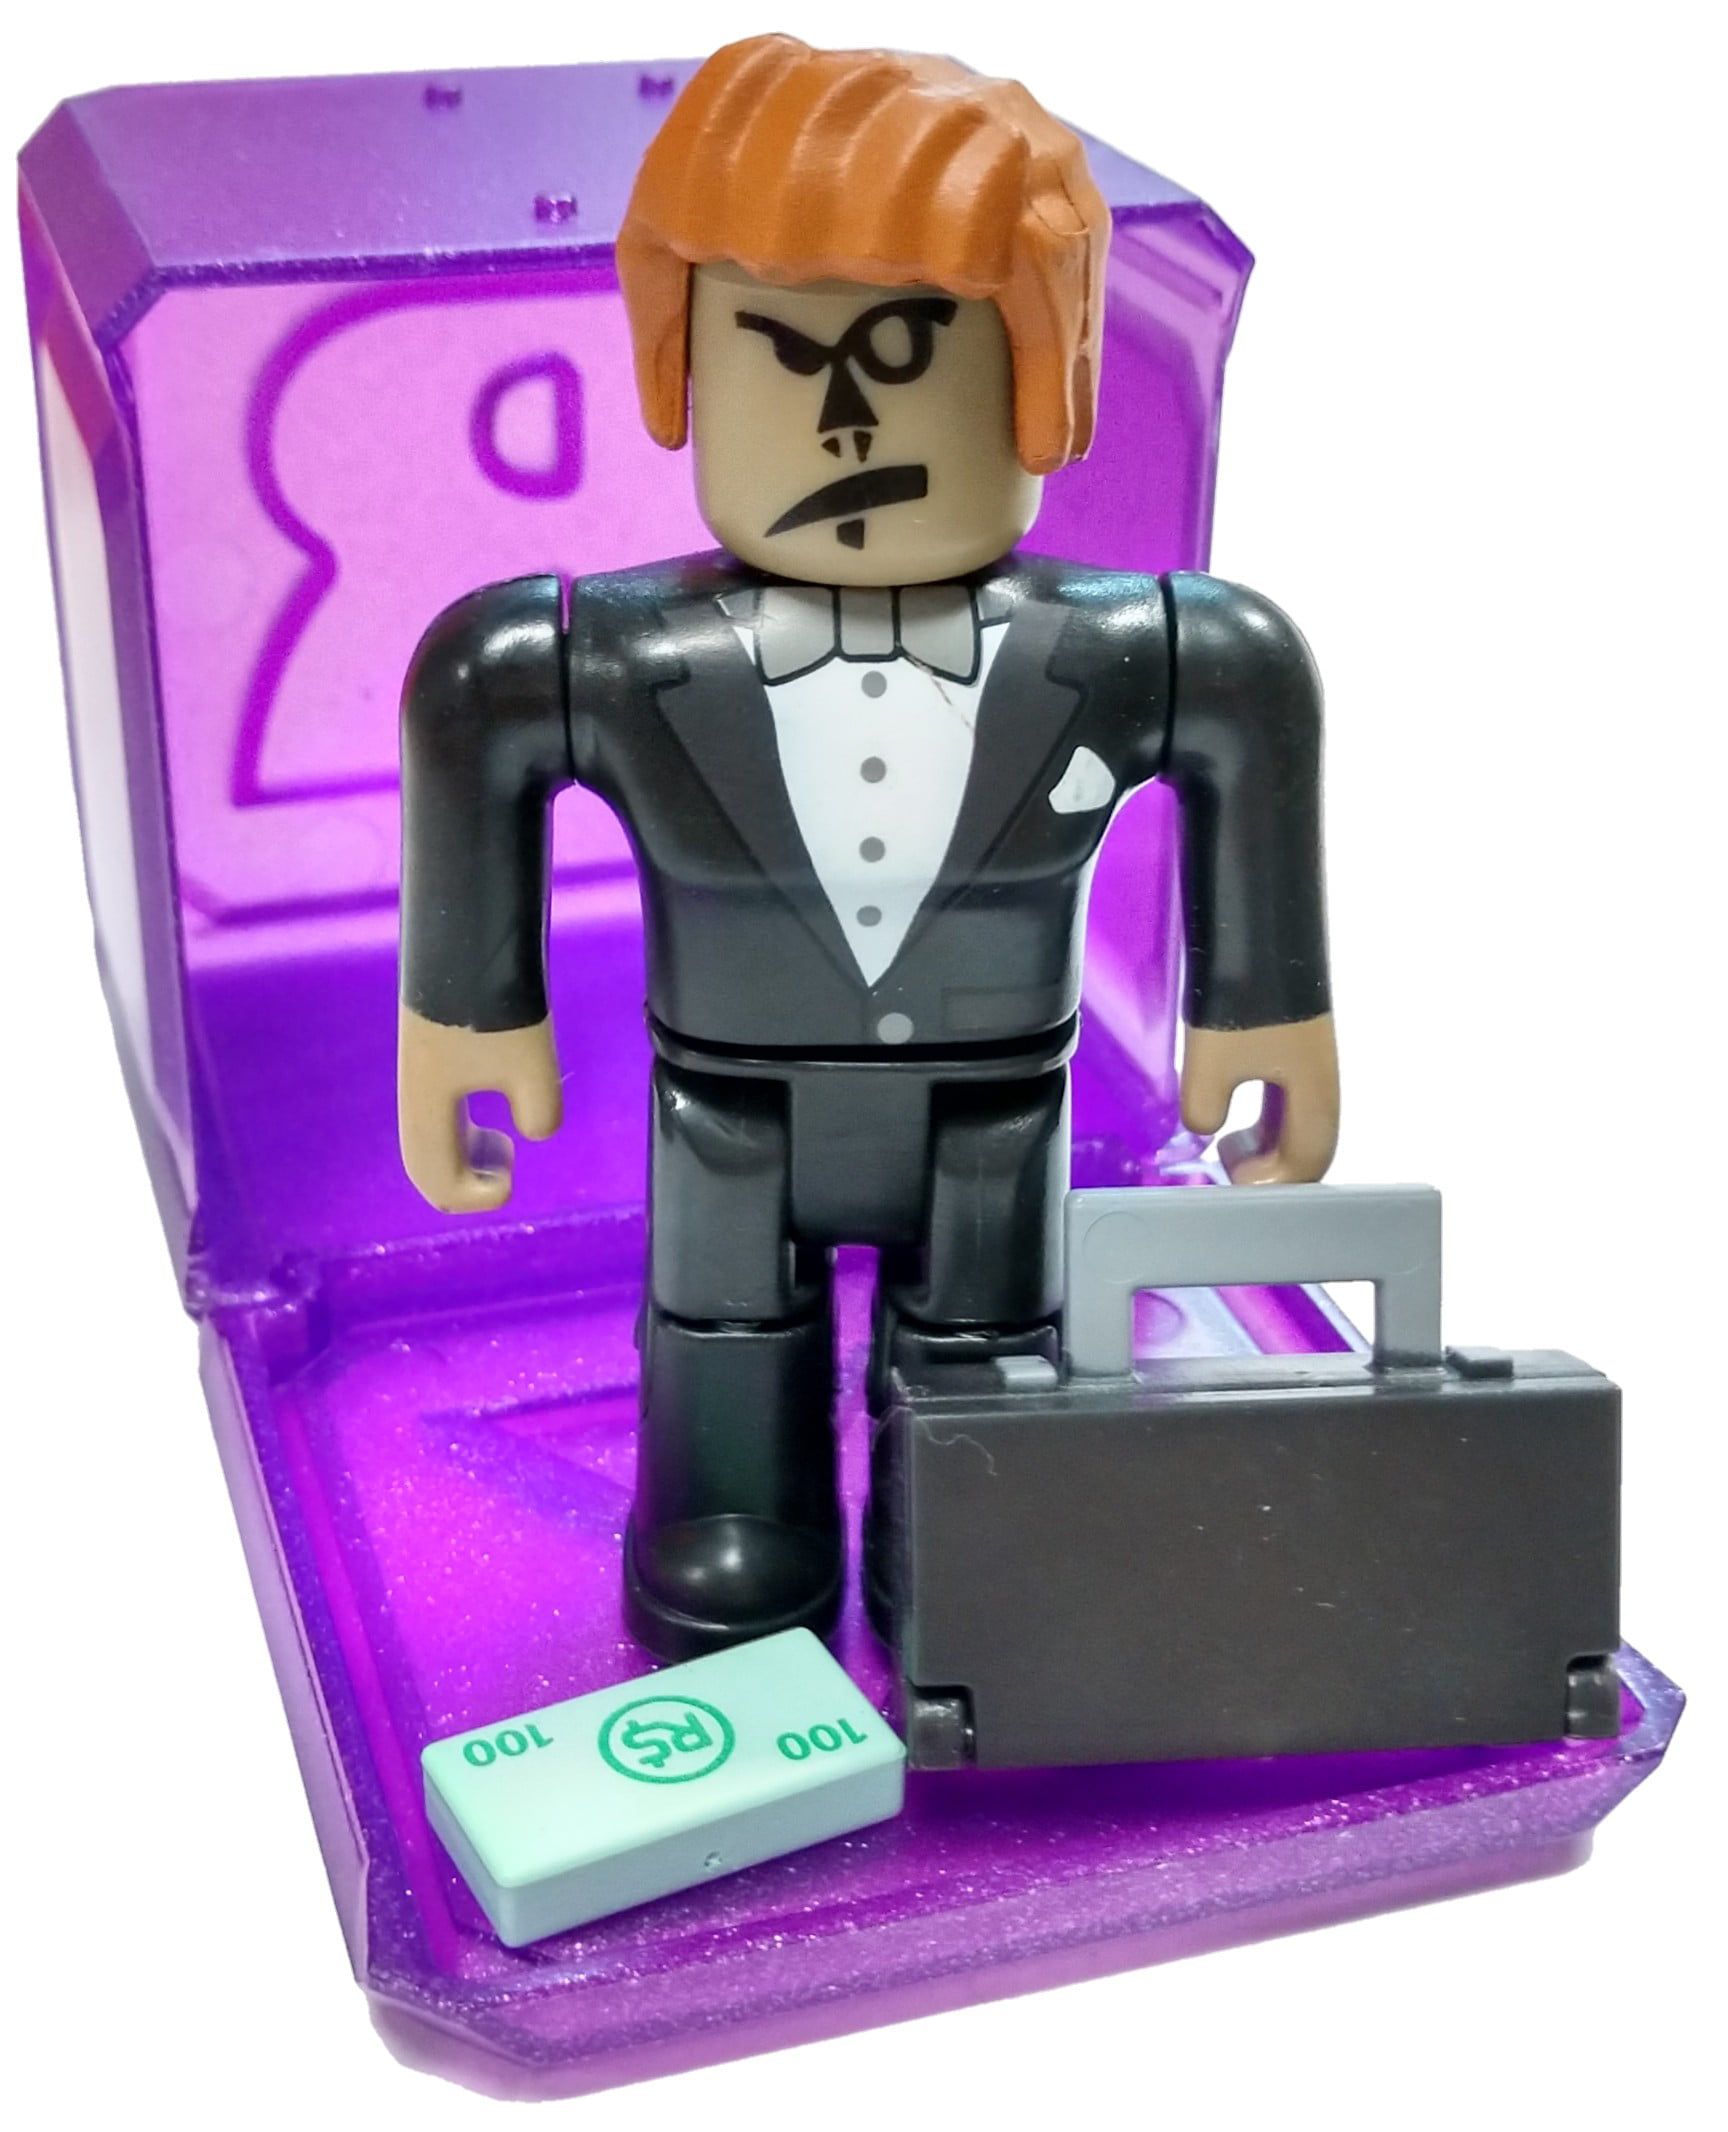 Roblox Celebrity Collection Series 3 10 Million Robux Man Mini